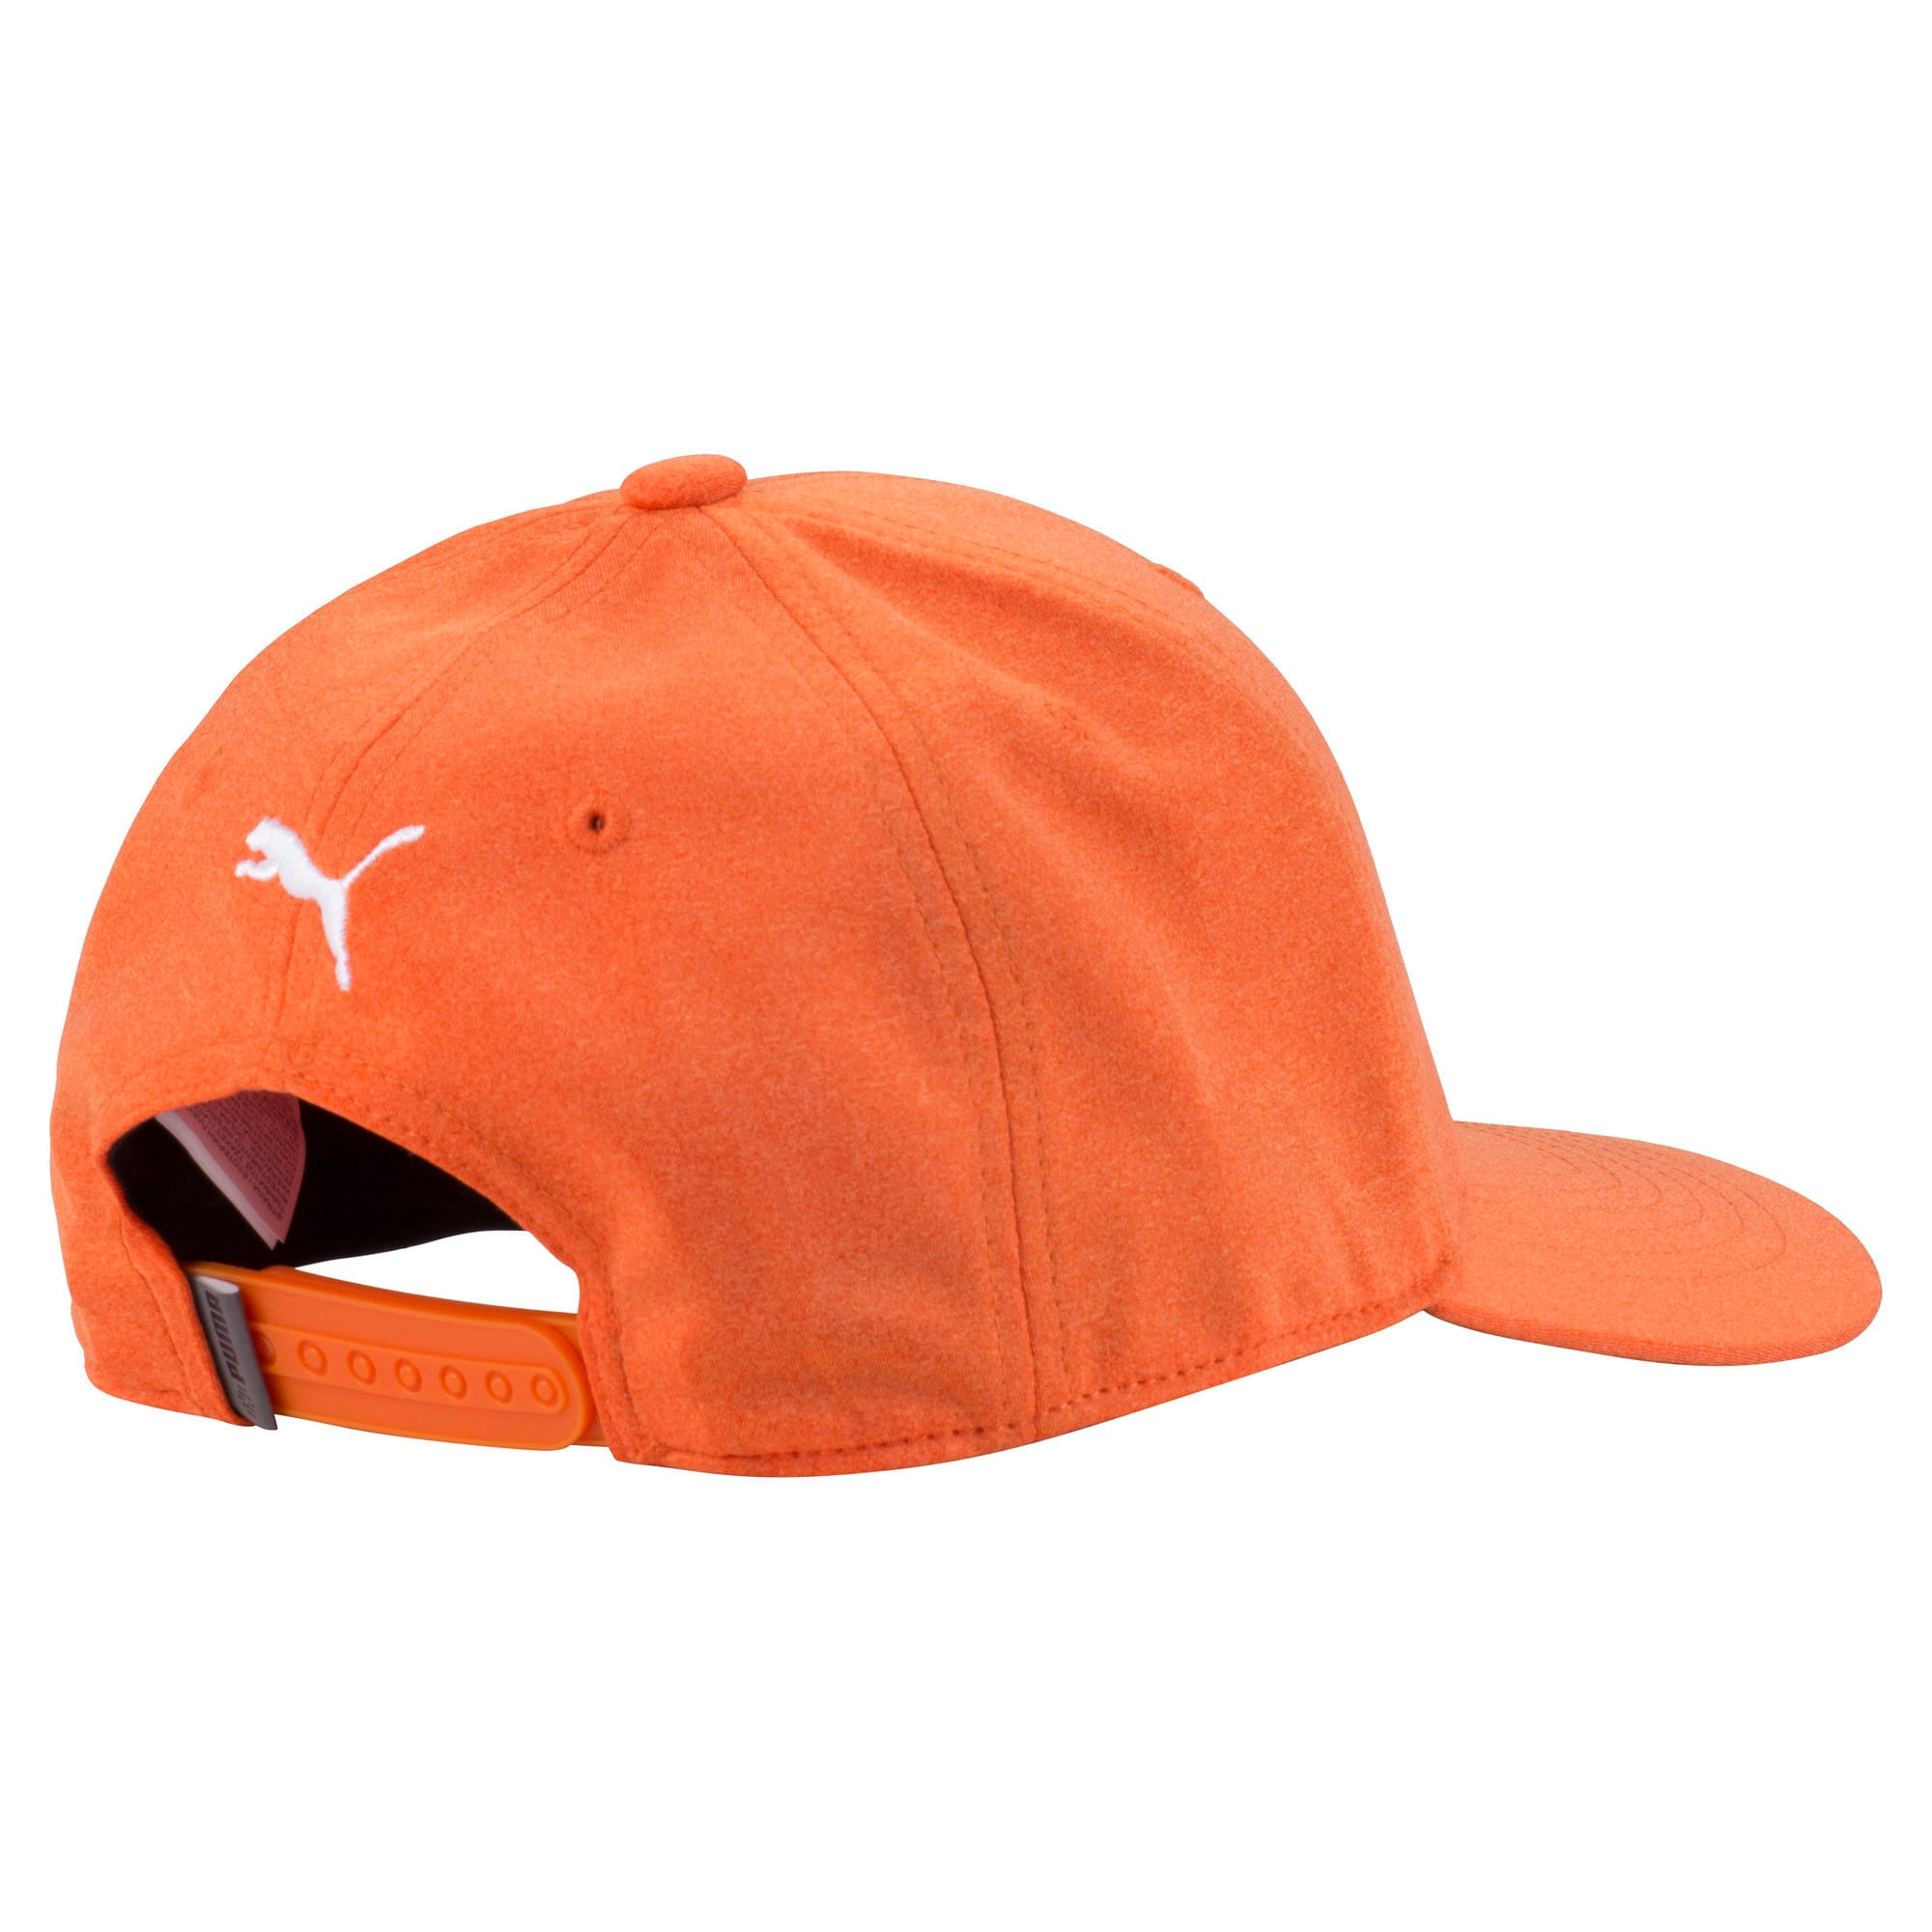 Thumbnail 2 of P Snapback Hat, Vibrant Orange, medium